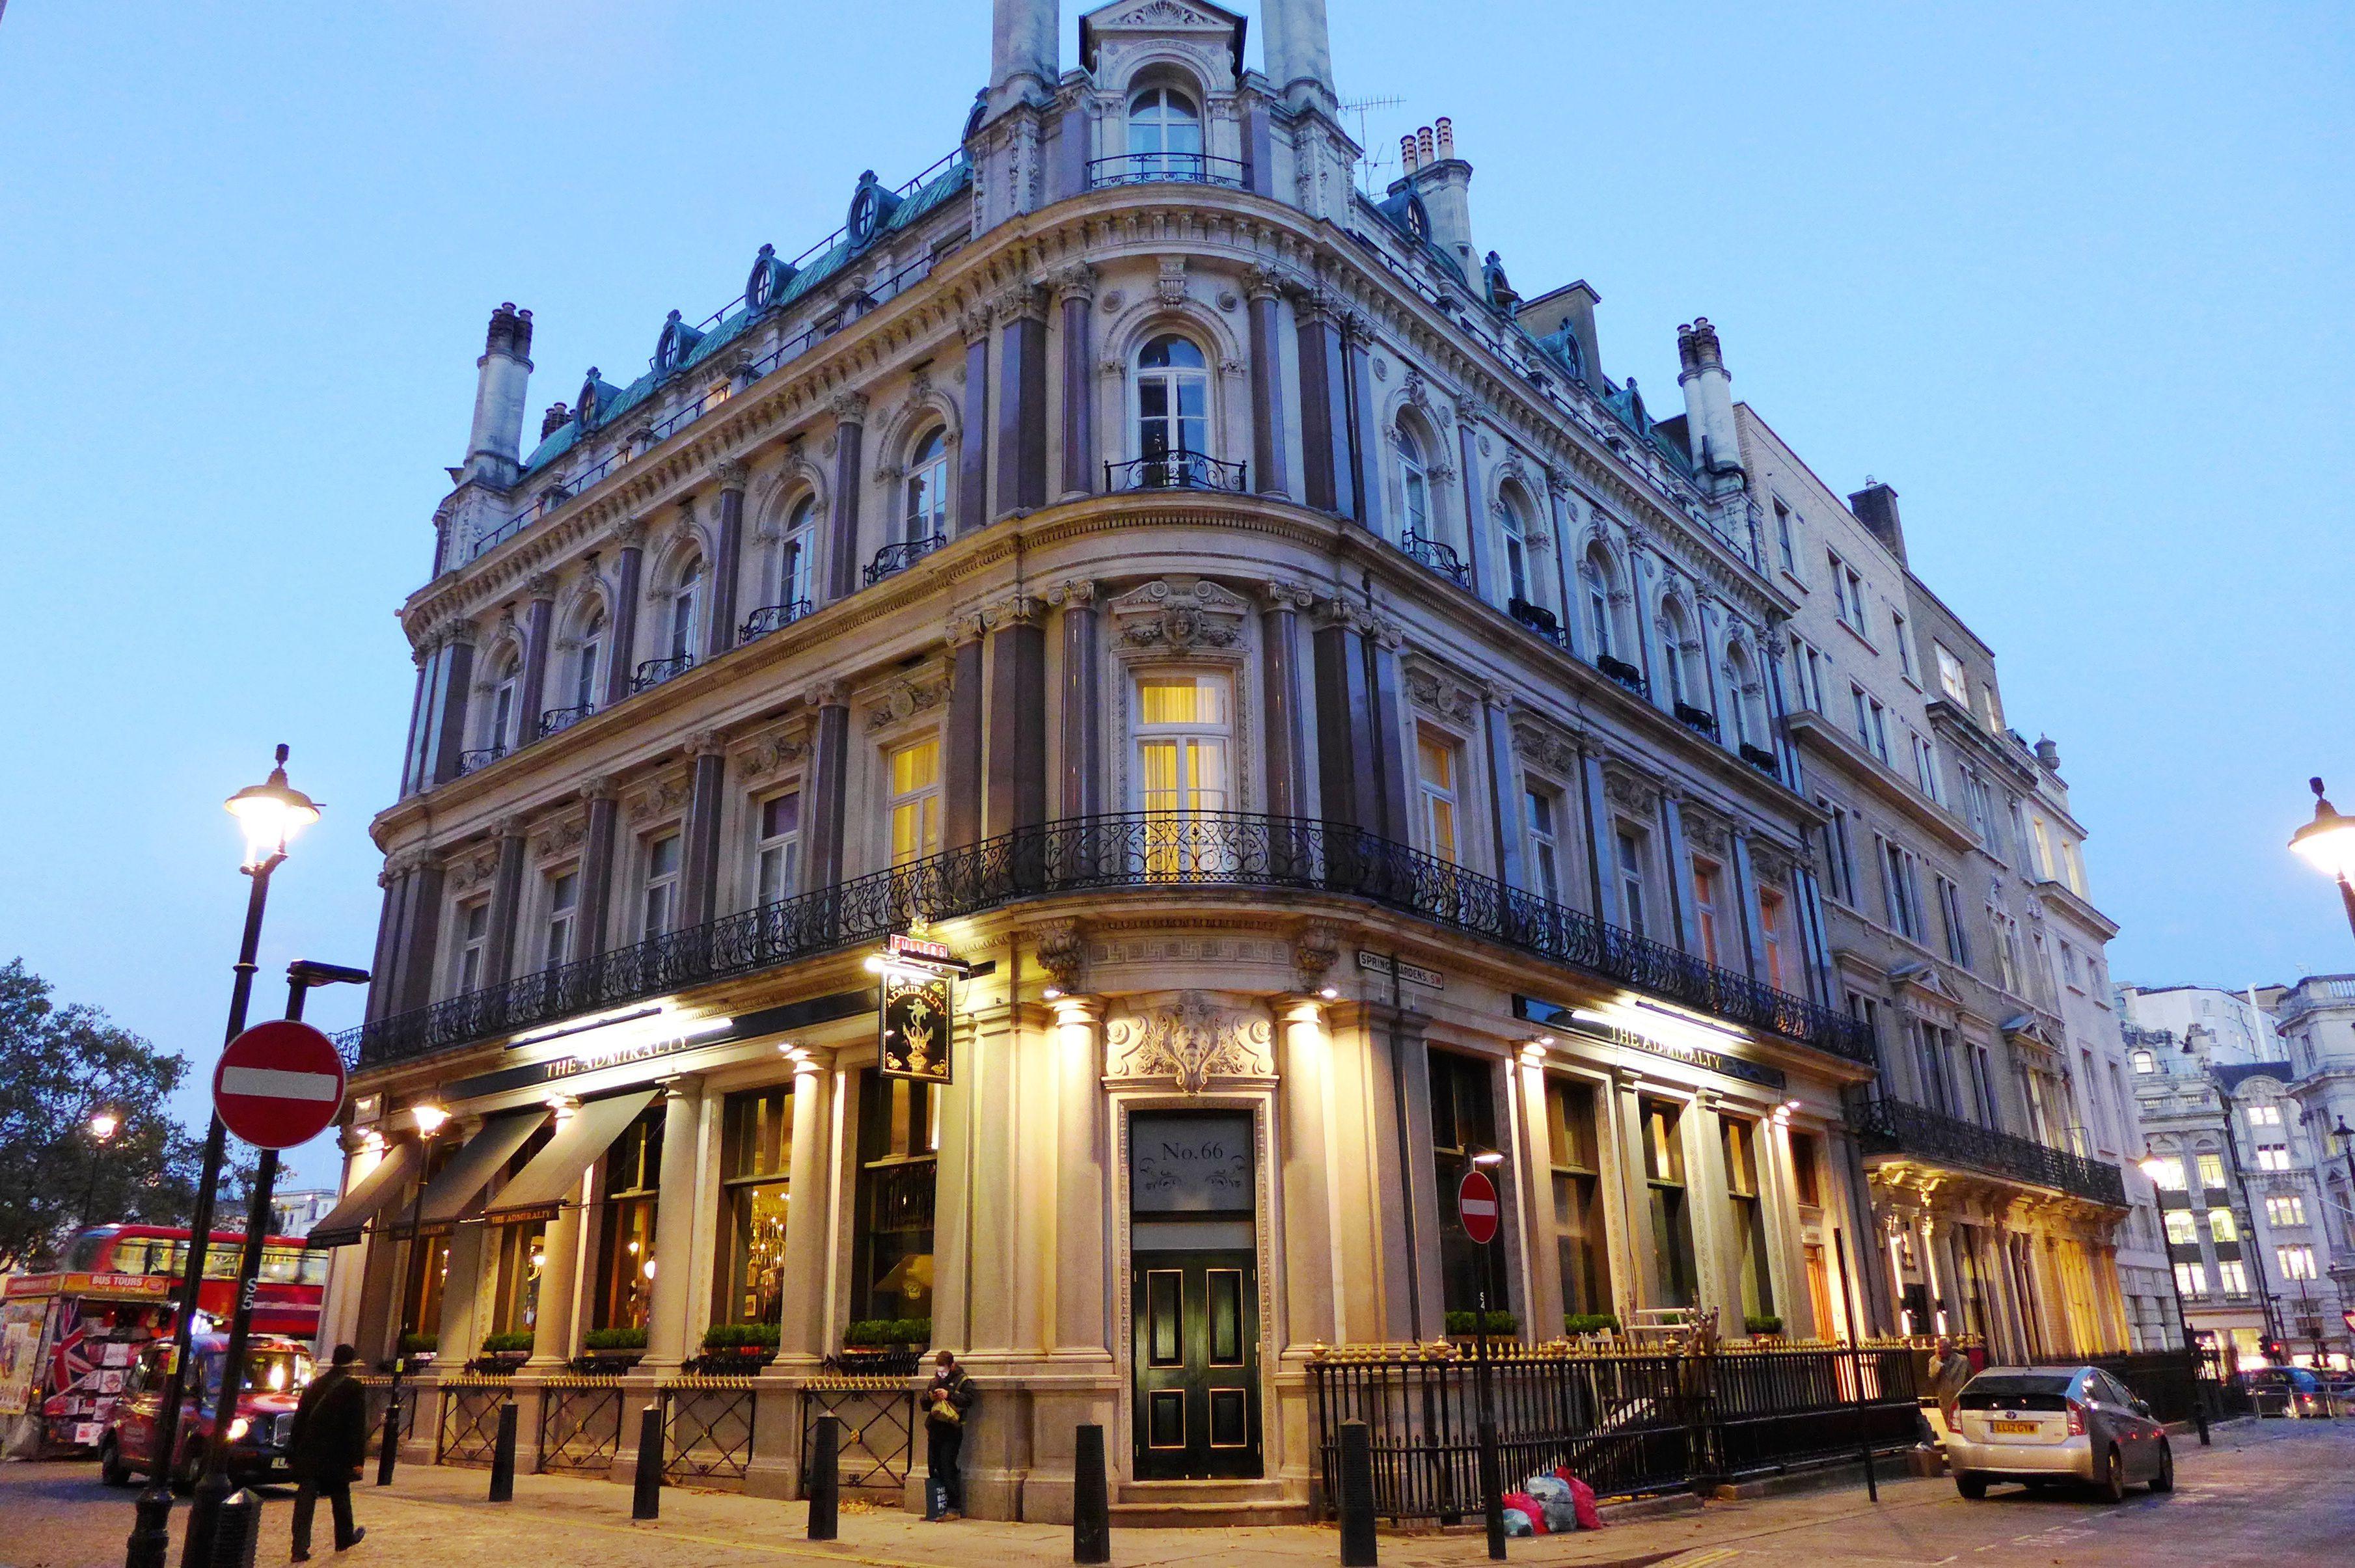 The Admiralty Pub, Trafalgar Square